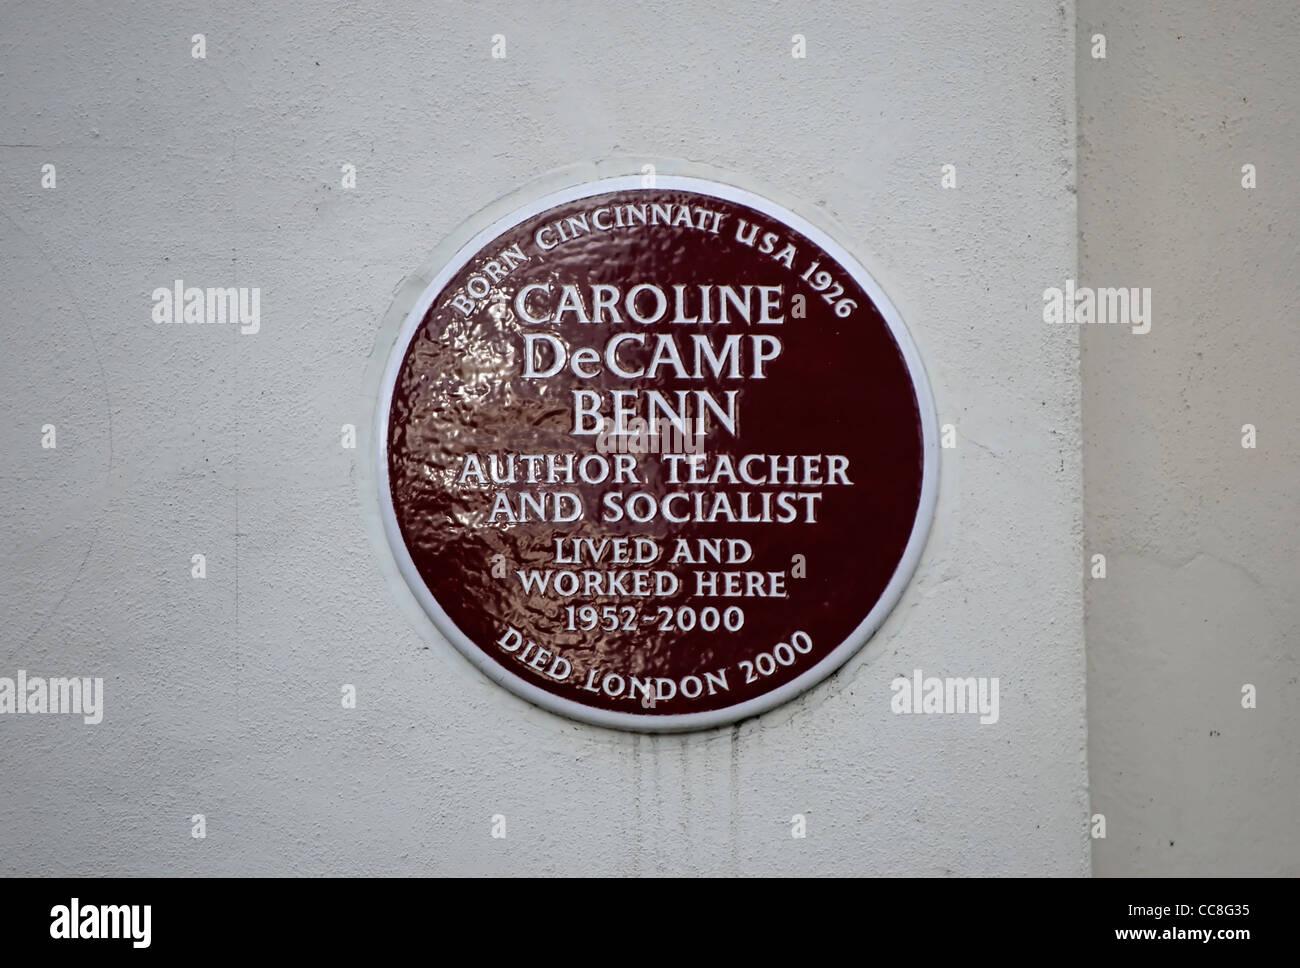 plaque marking a home of author, teacher and socialist caroline decamp benn, wife of politician tony benn,  london, - Stock Image